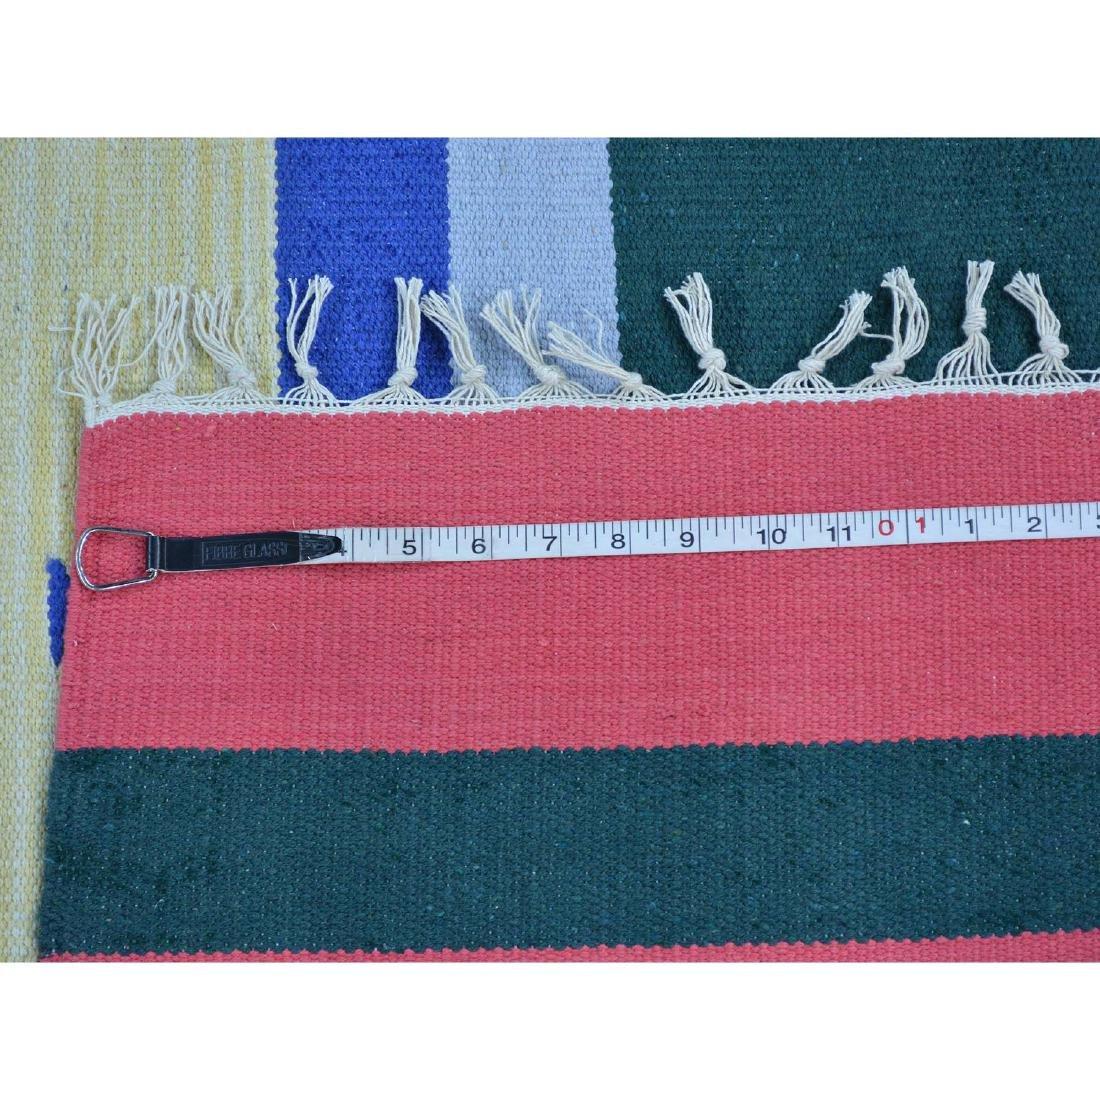 Navajo Design Runner Flat Weave Kilim Hand Woven Rug - 5